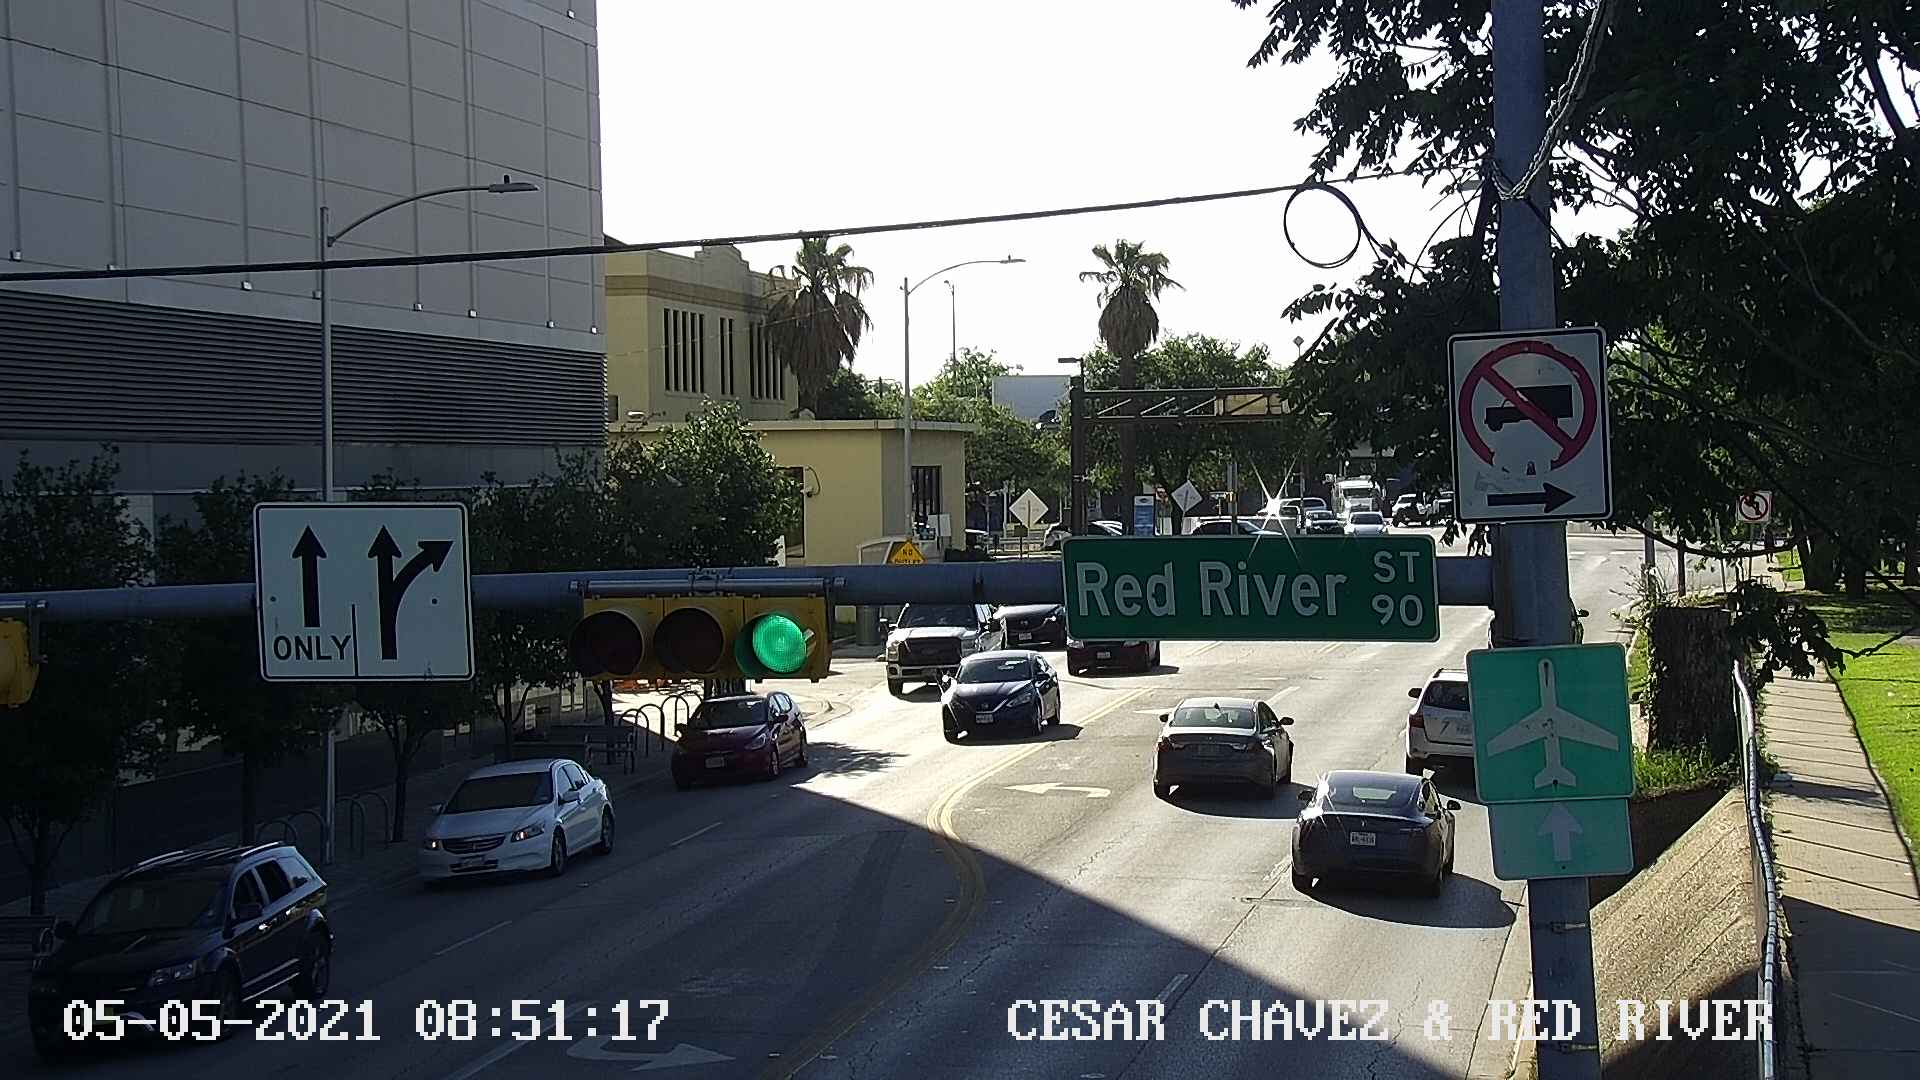 CESAR CHAVEZ ST / RED RIVER ST